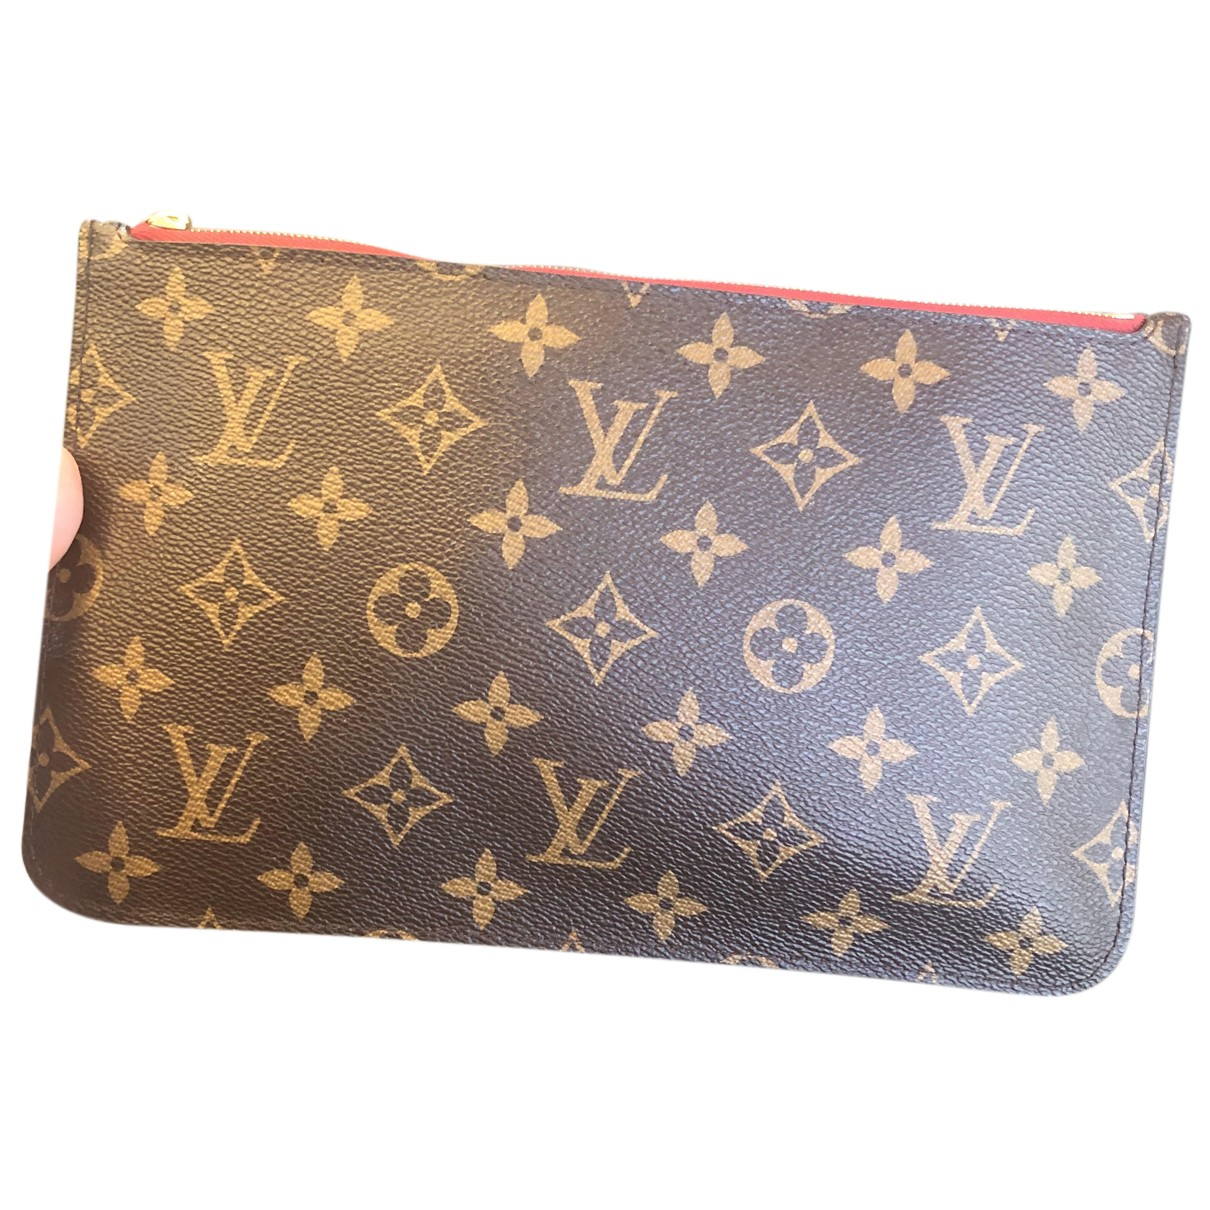 Pochette Neverfull de Lona Louis Vuitton